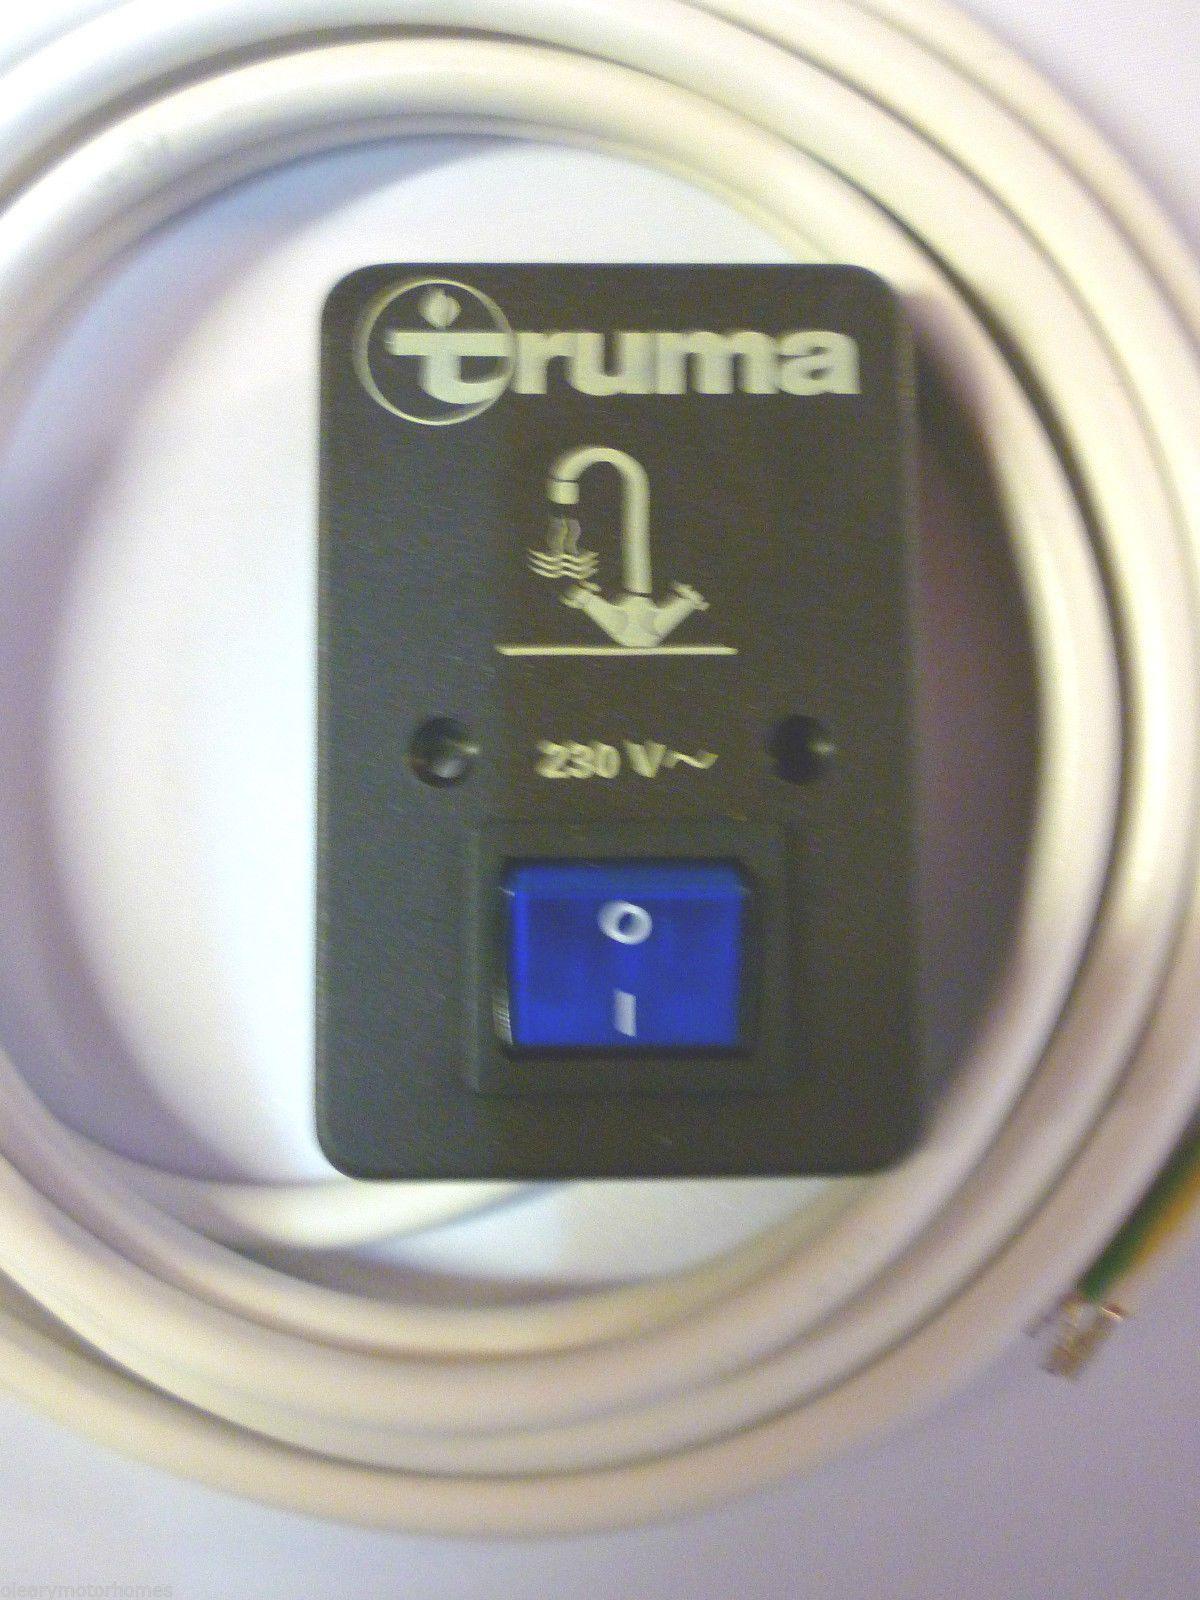 Verrassend Truma boiler Control Switch motorhome caravan trumatic c PI-78